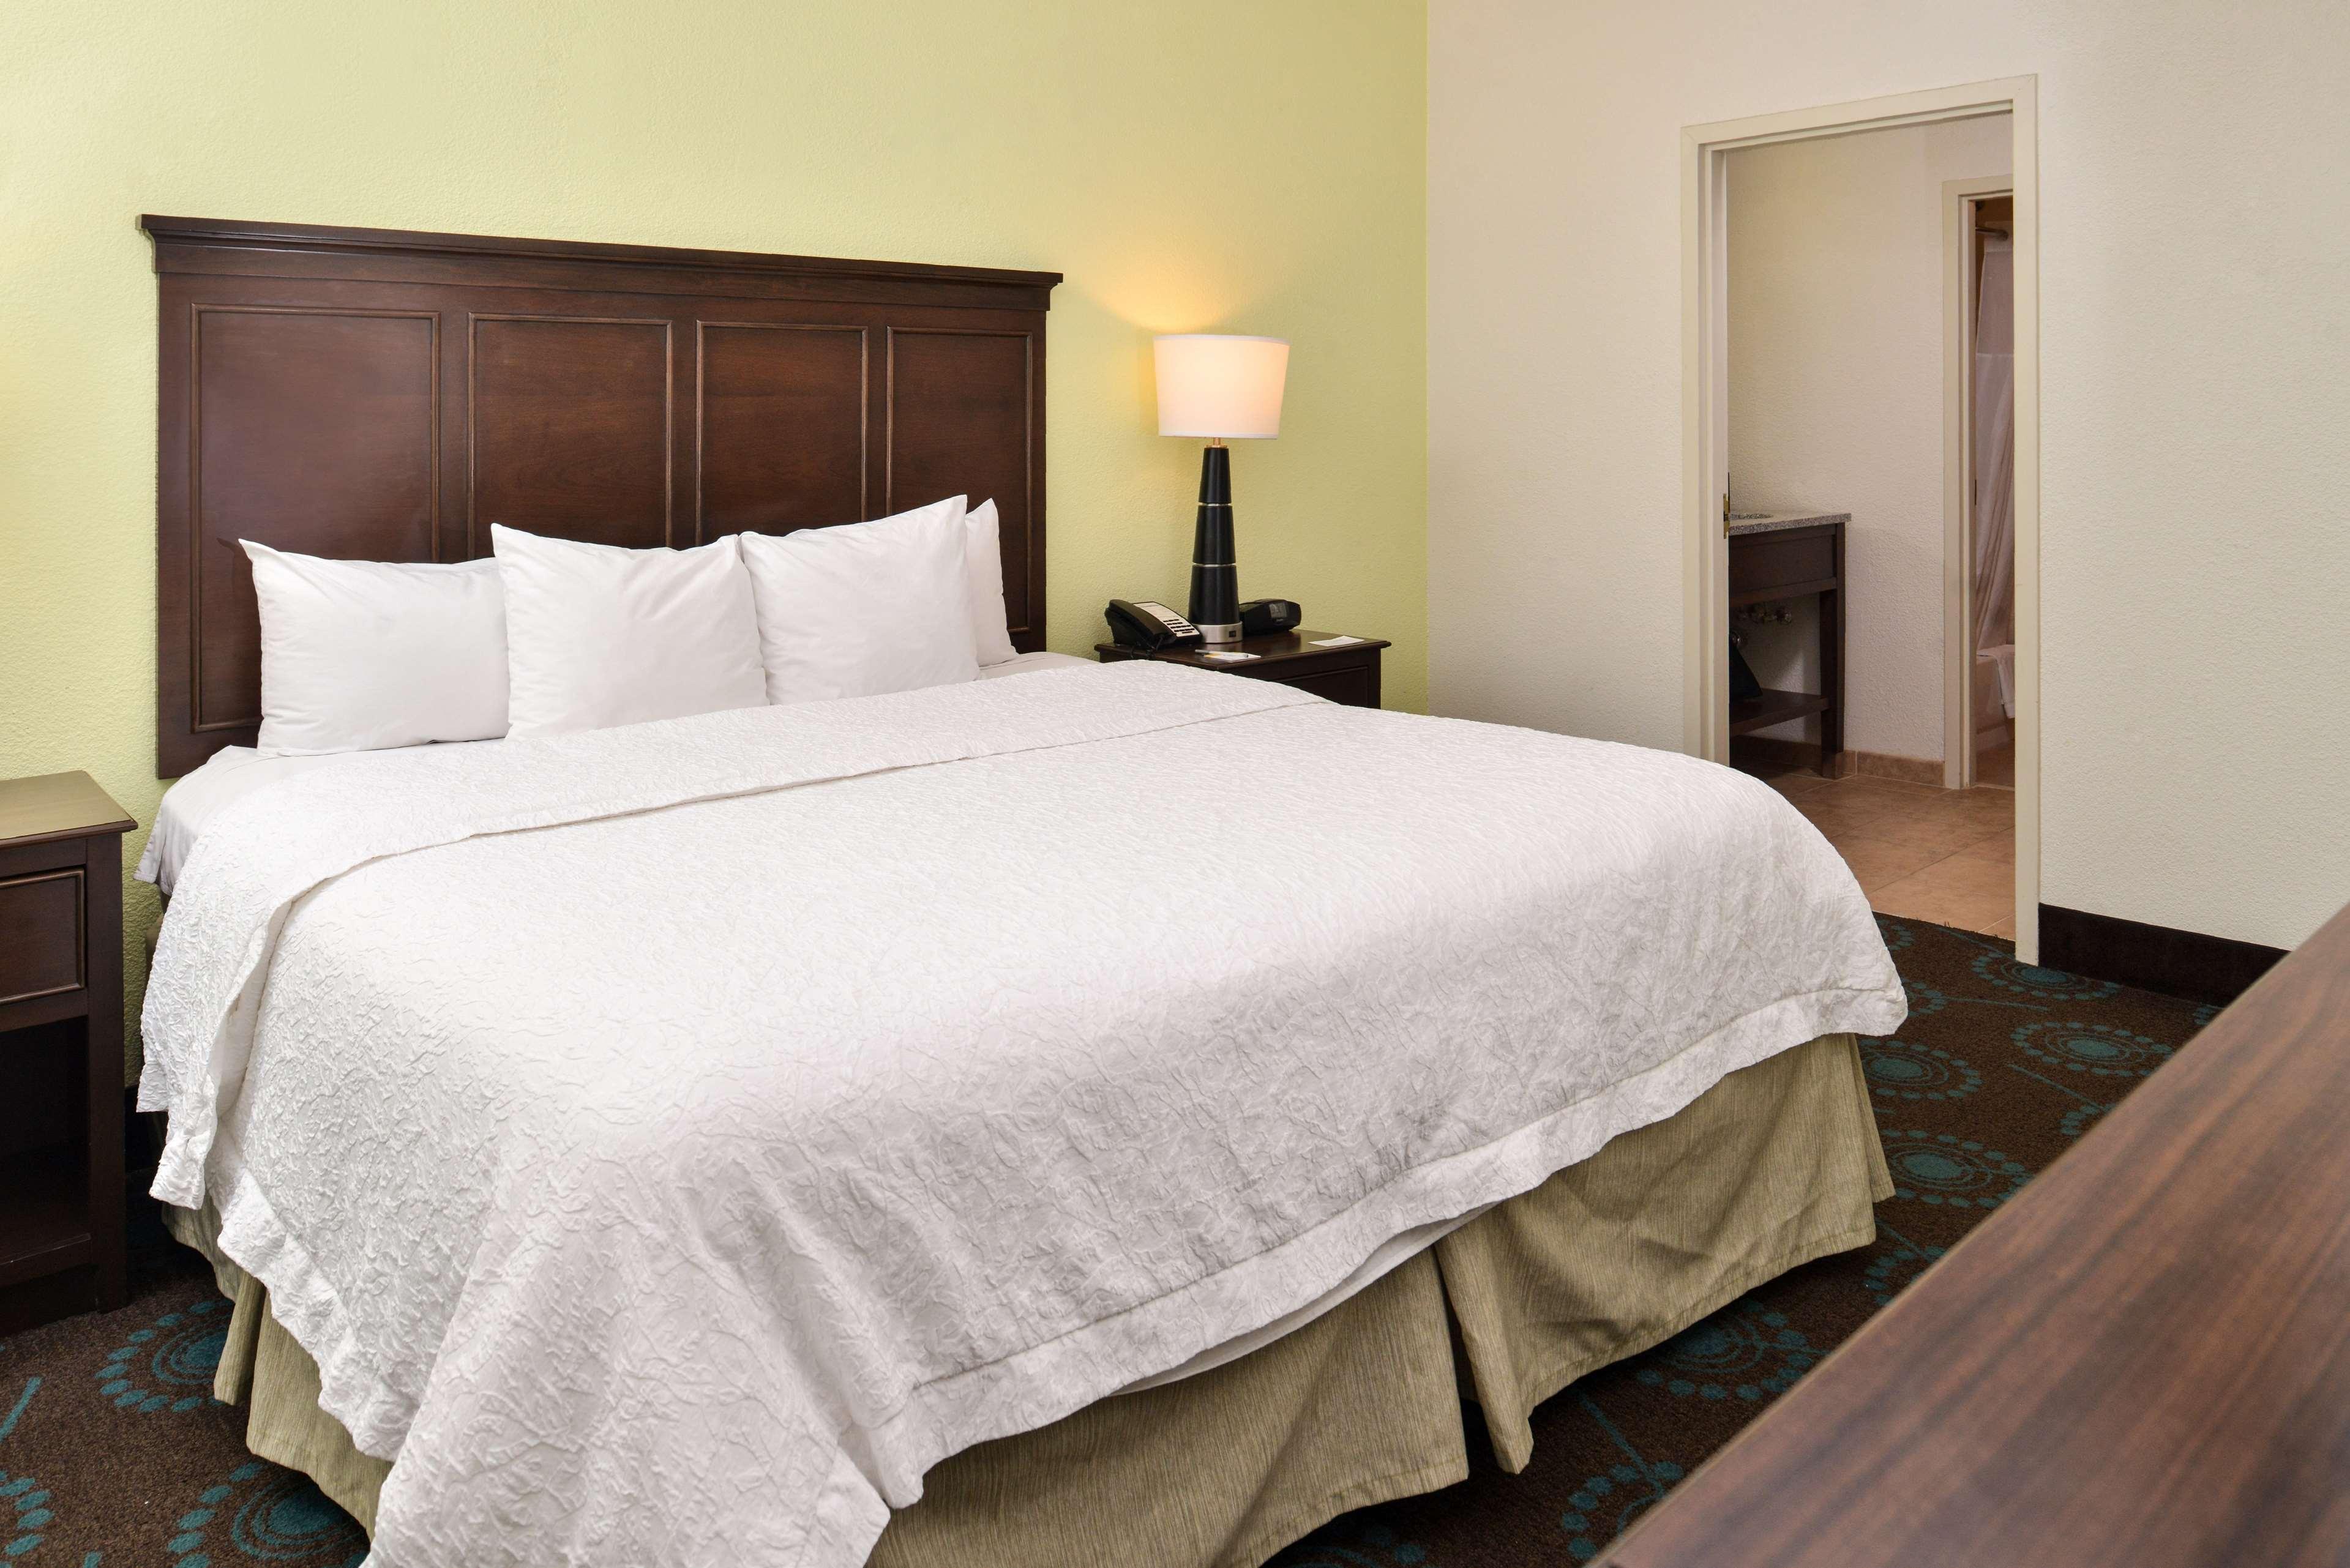 Hampton Inn & Suites Newport News (Oyster Point) image 14